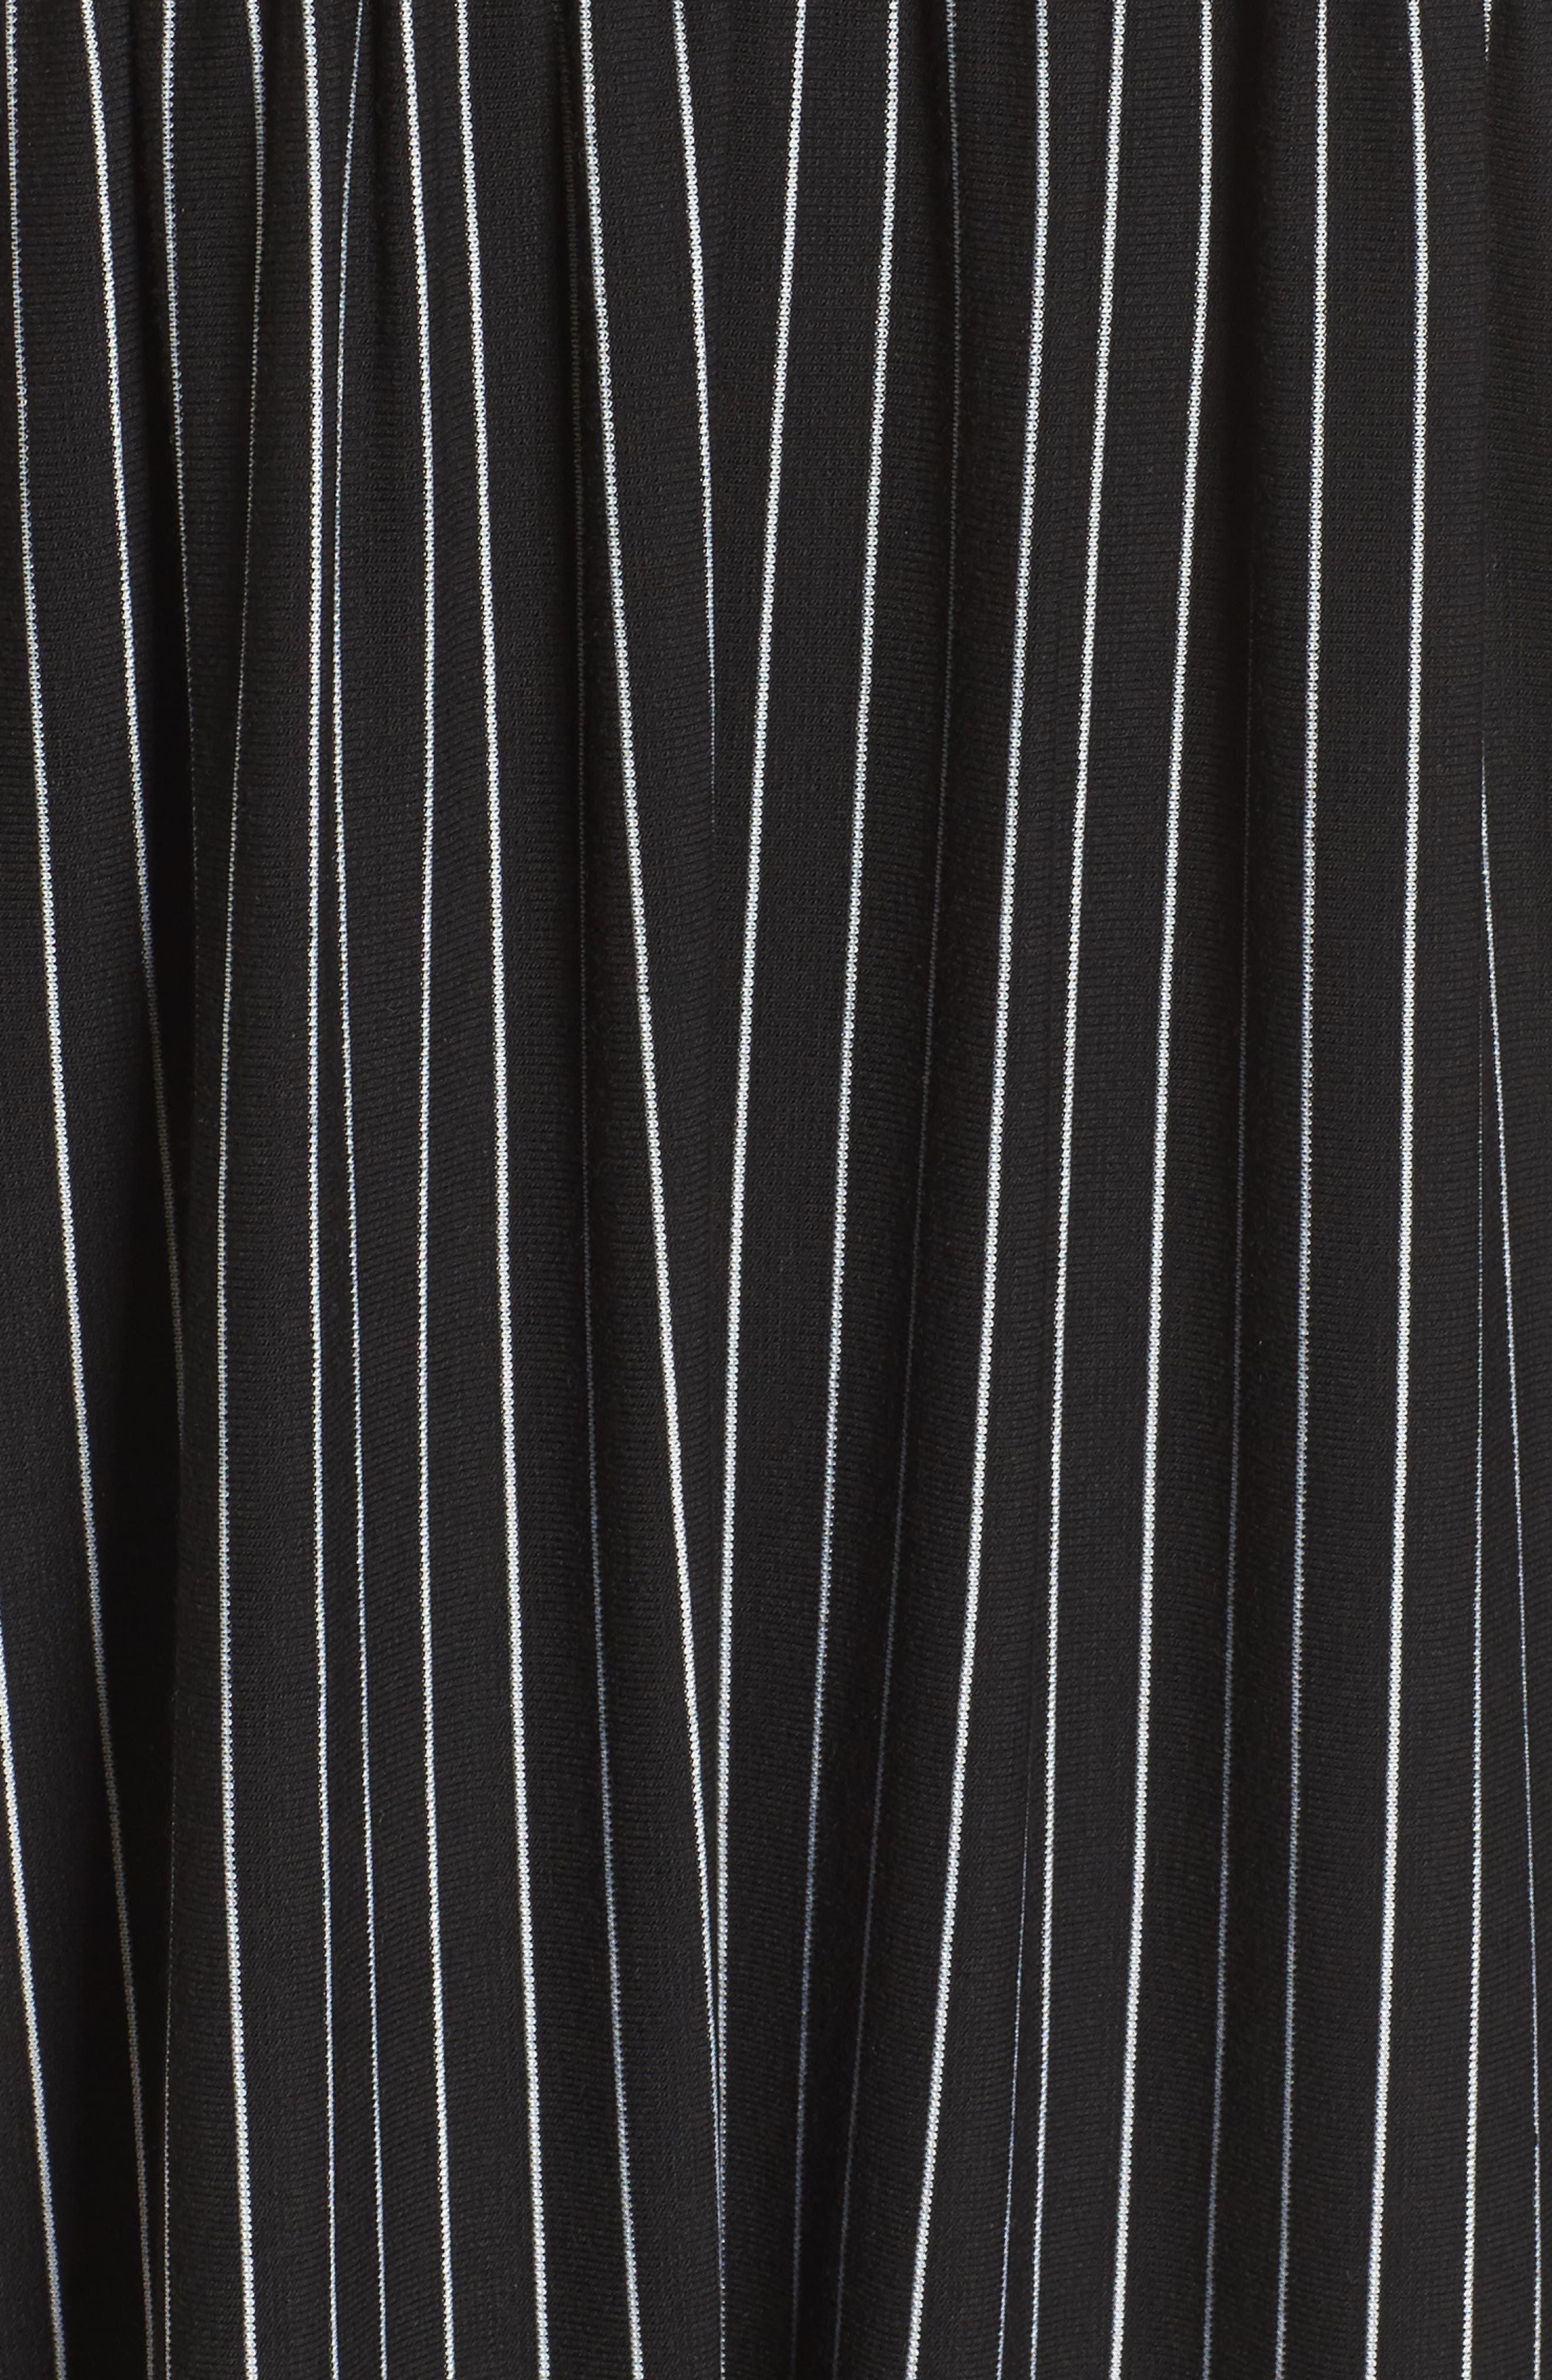 Embroidered Babydoll Dress,                             Alternate thumbnail 5, color,                             Black